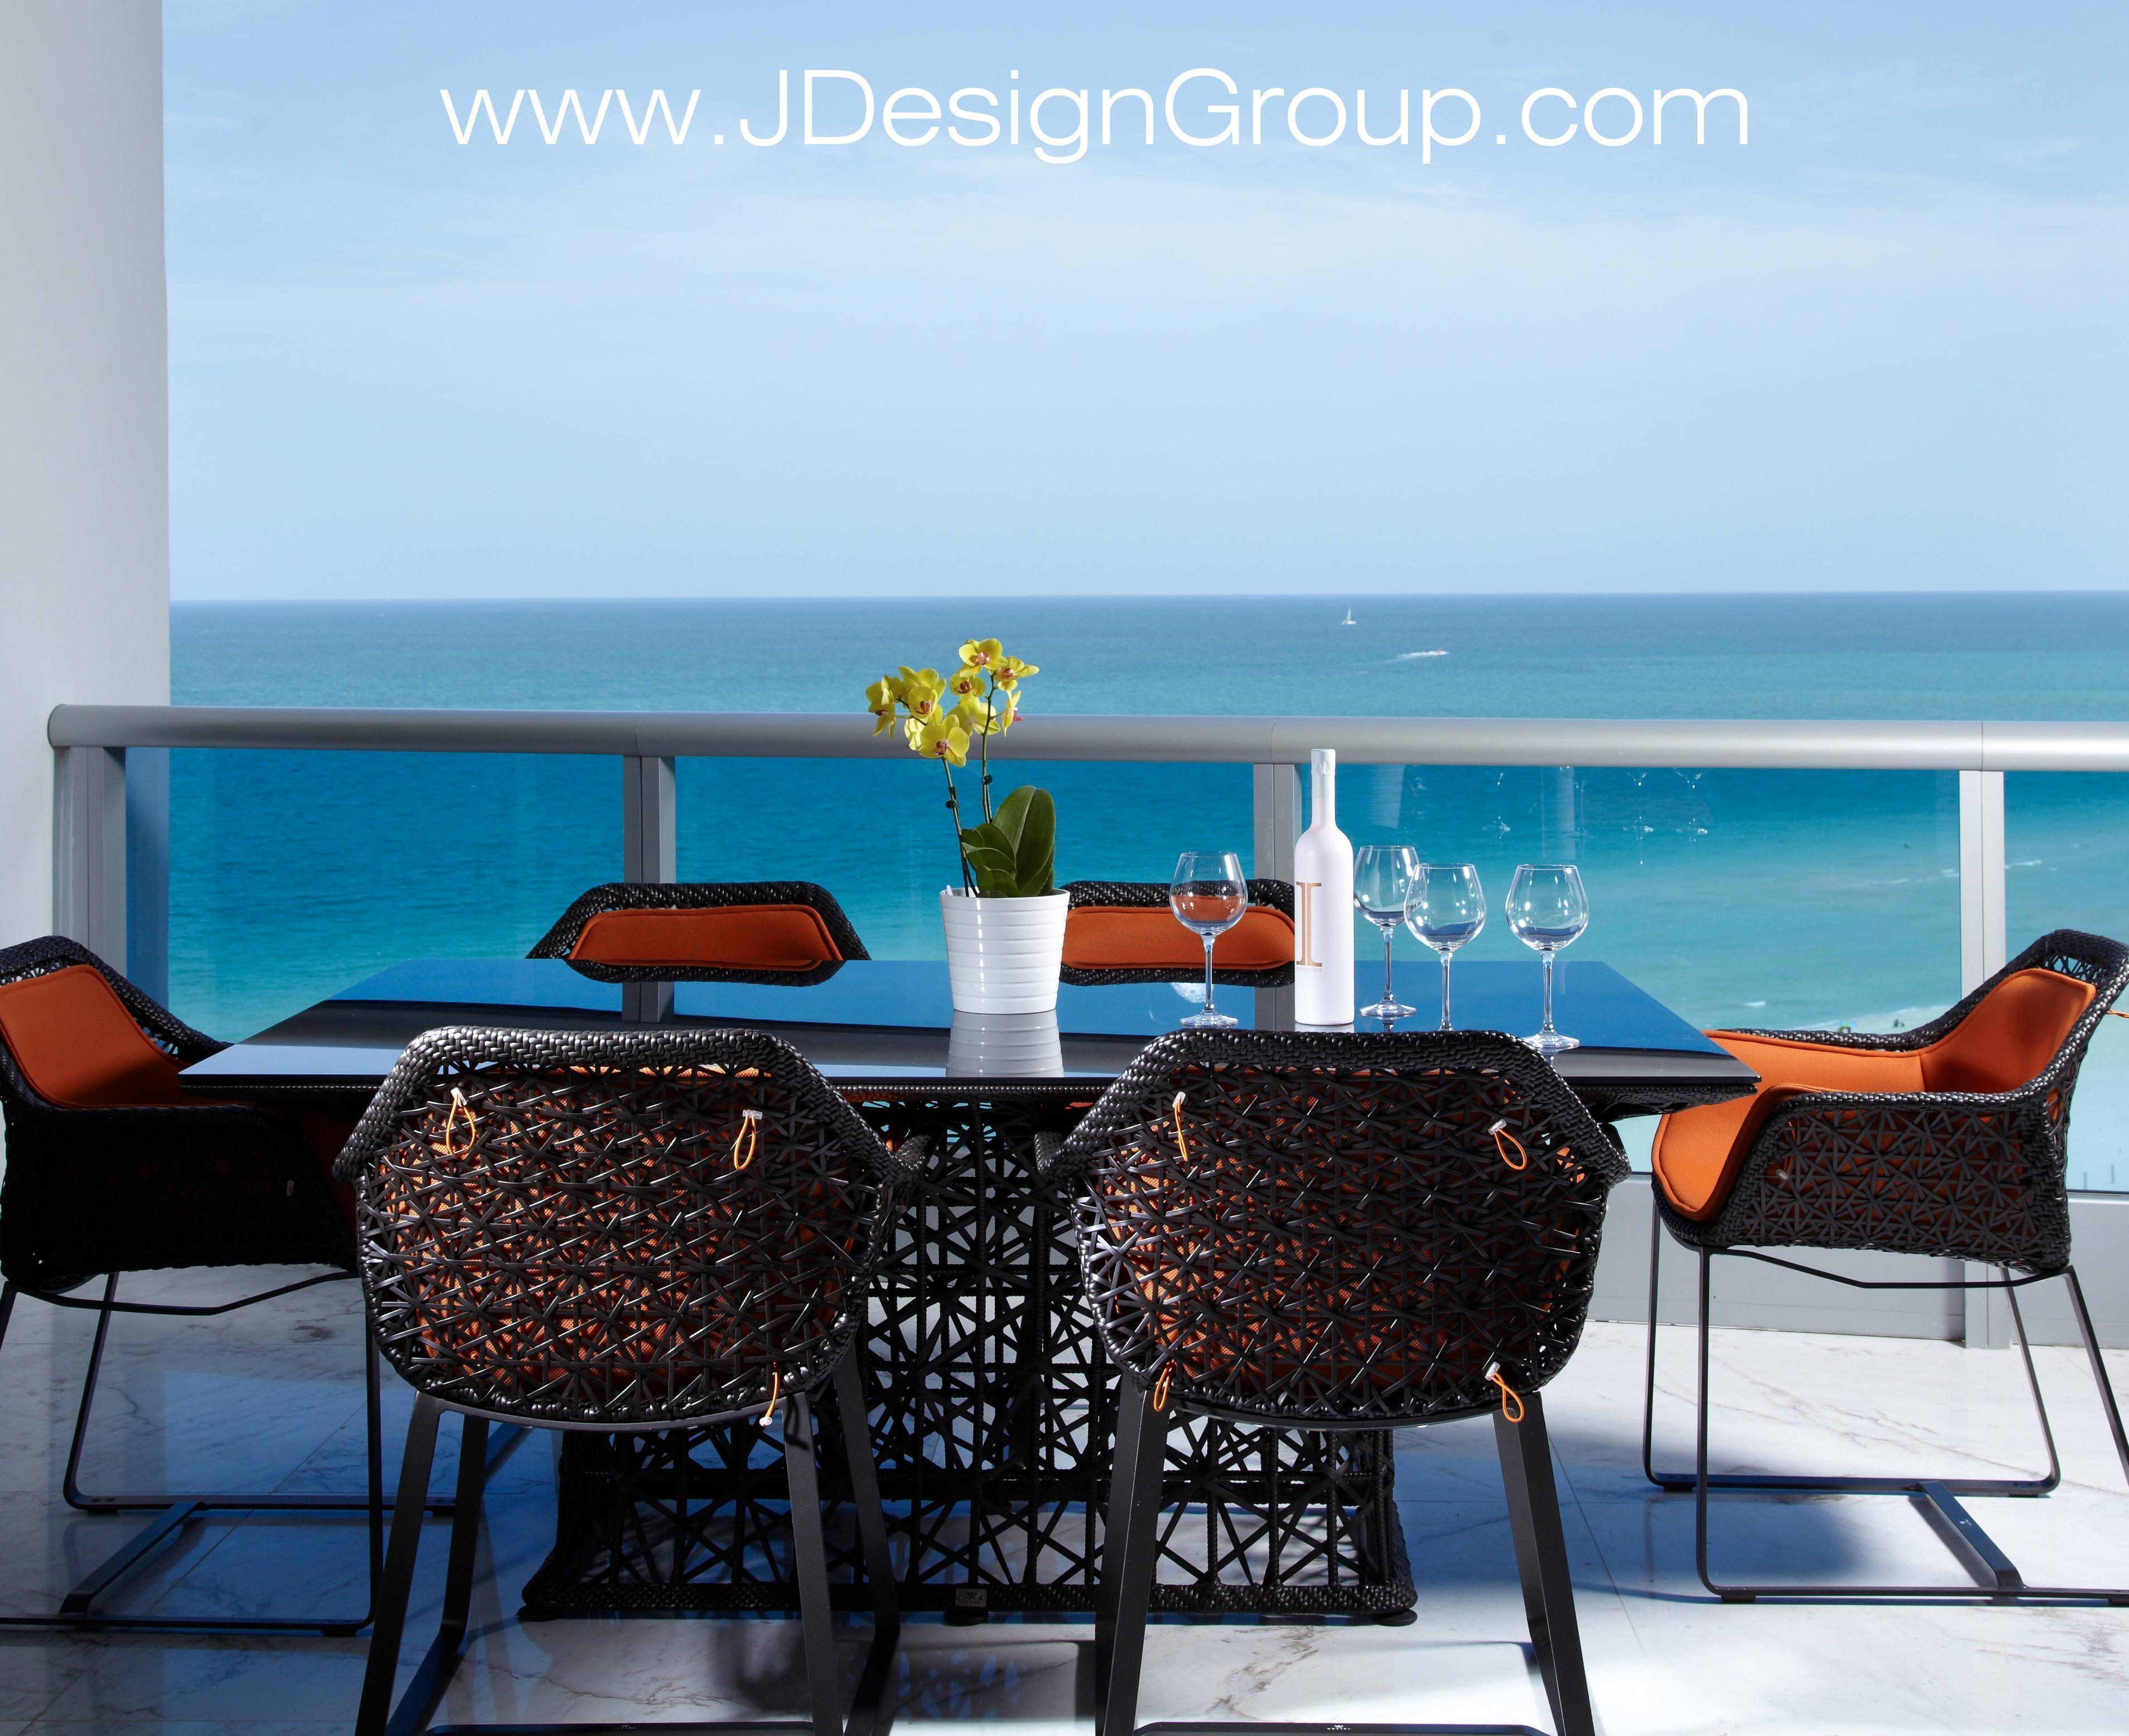 J Design Group In Coral Gables Fl 33134